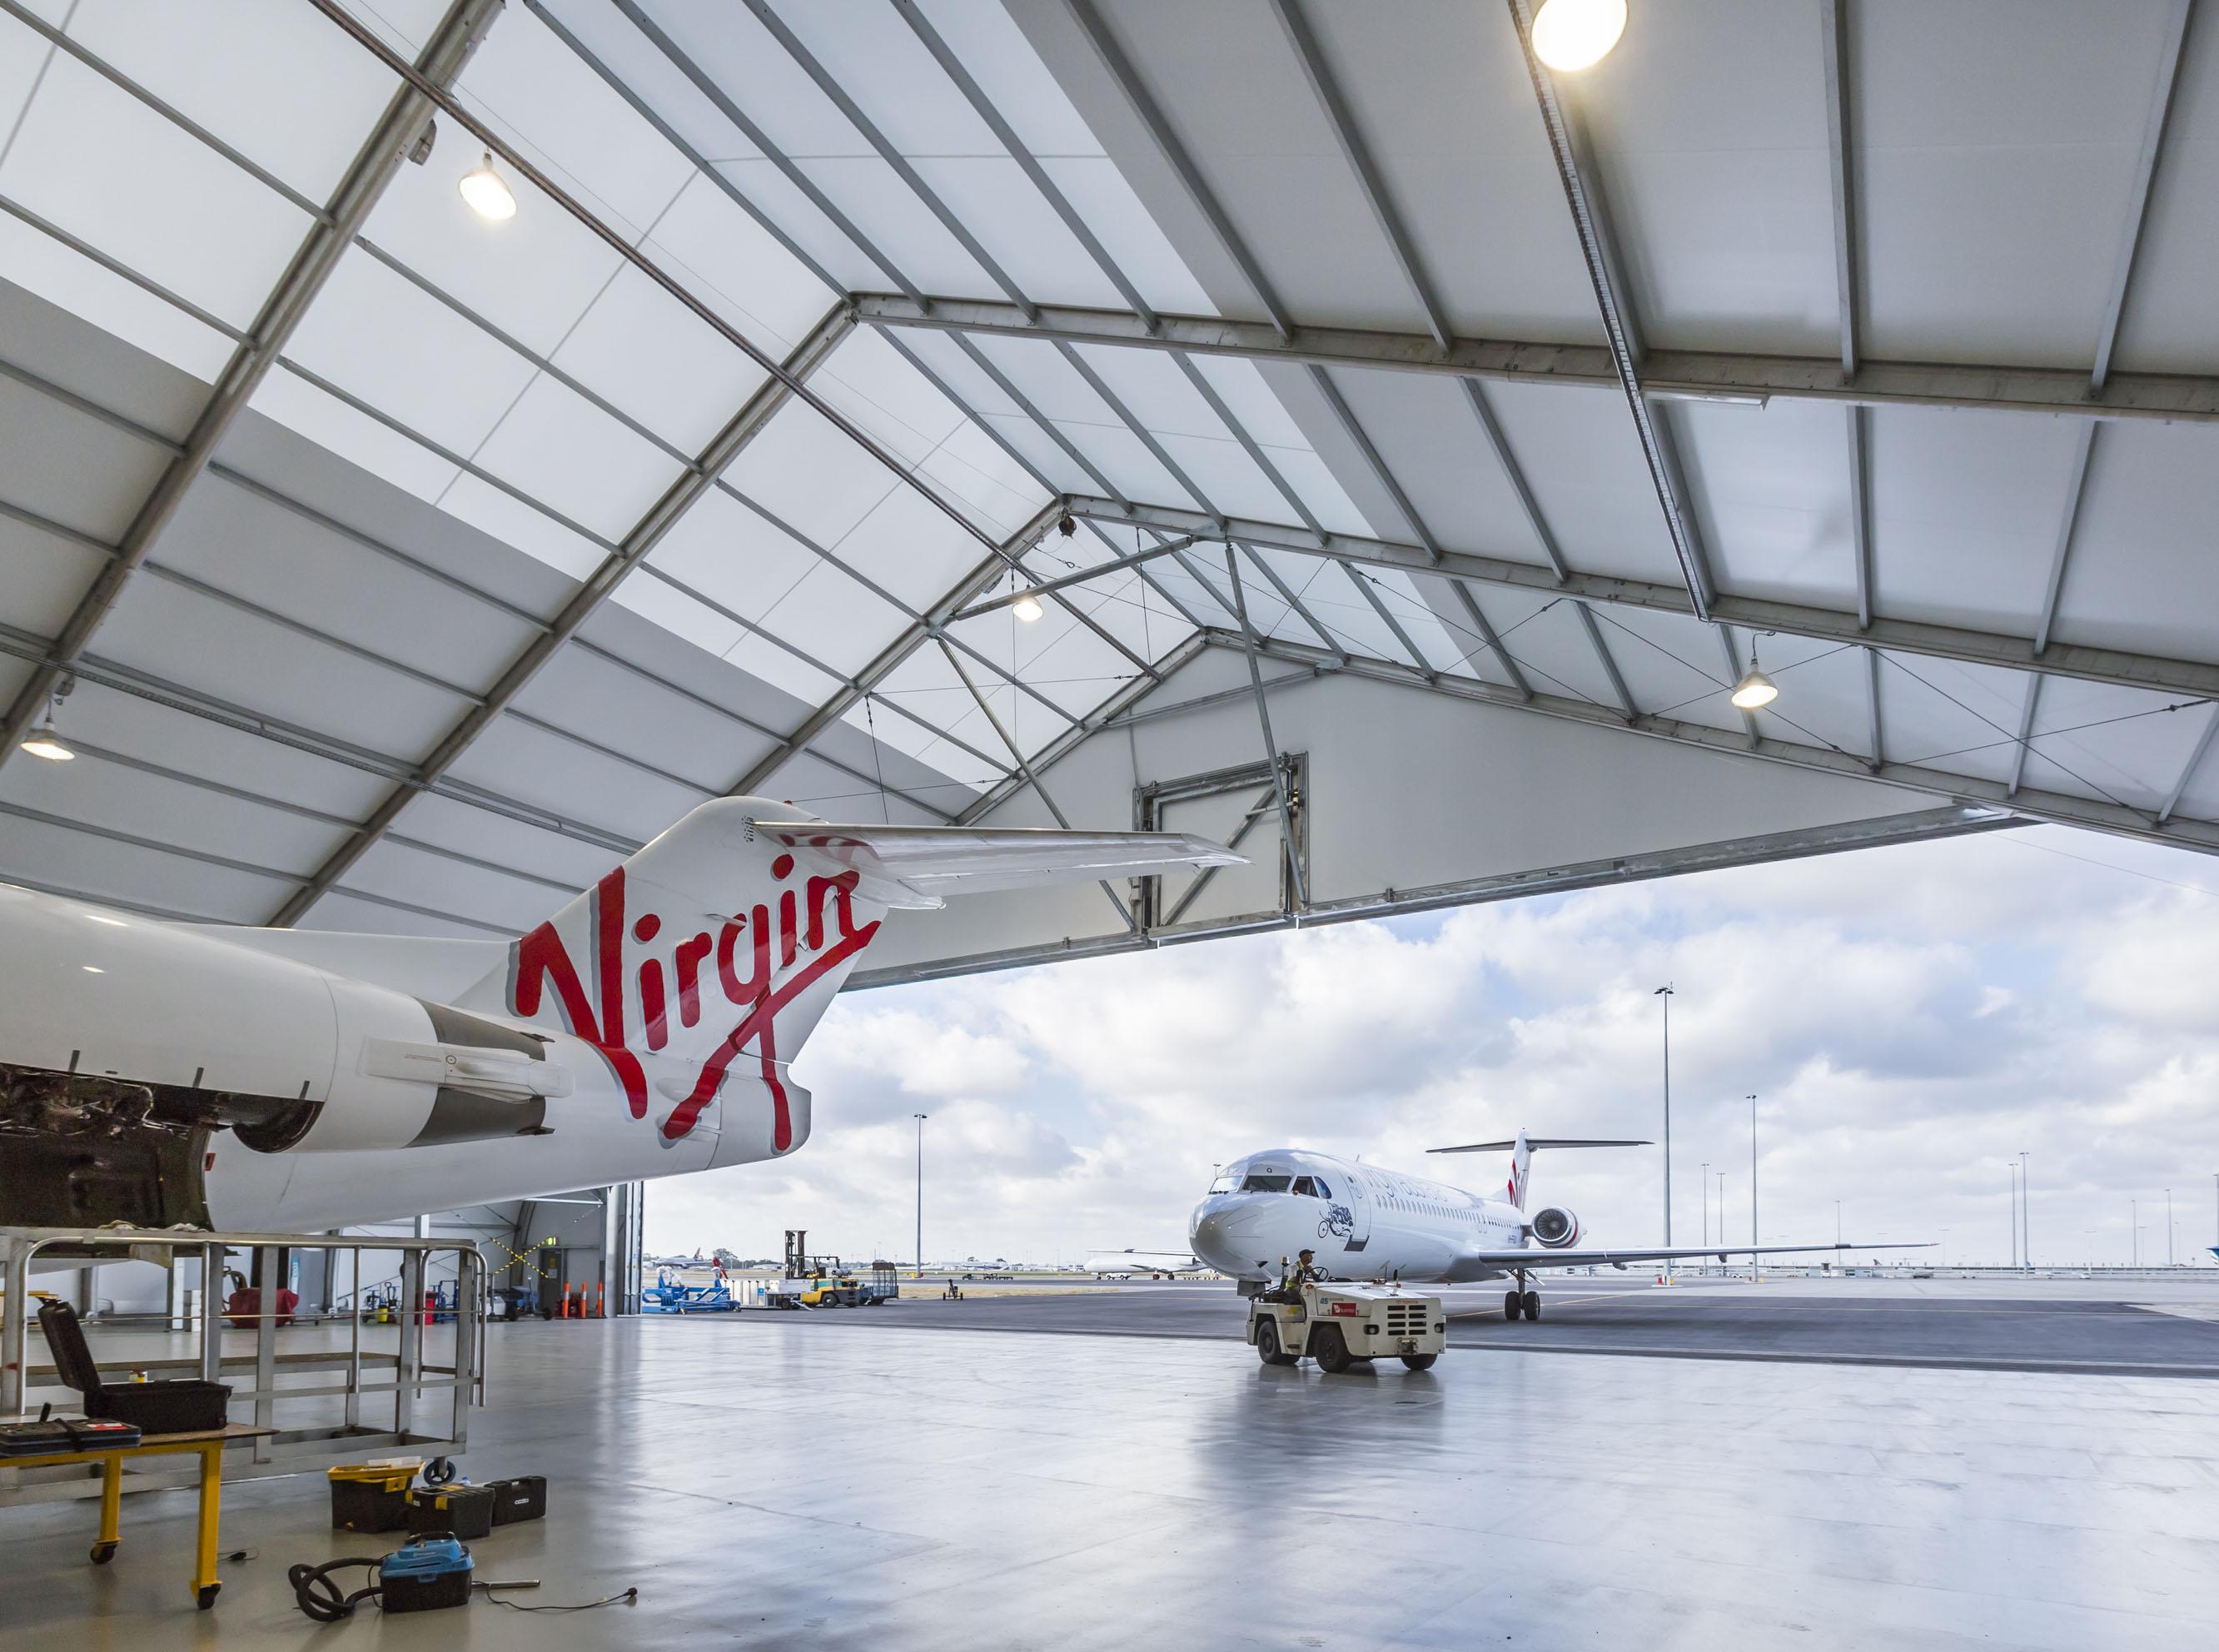 8189-virgin-hangar-pvc-2013-fs-2